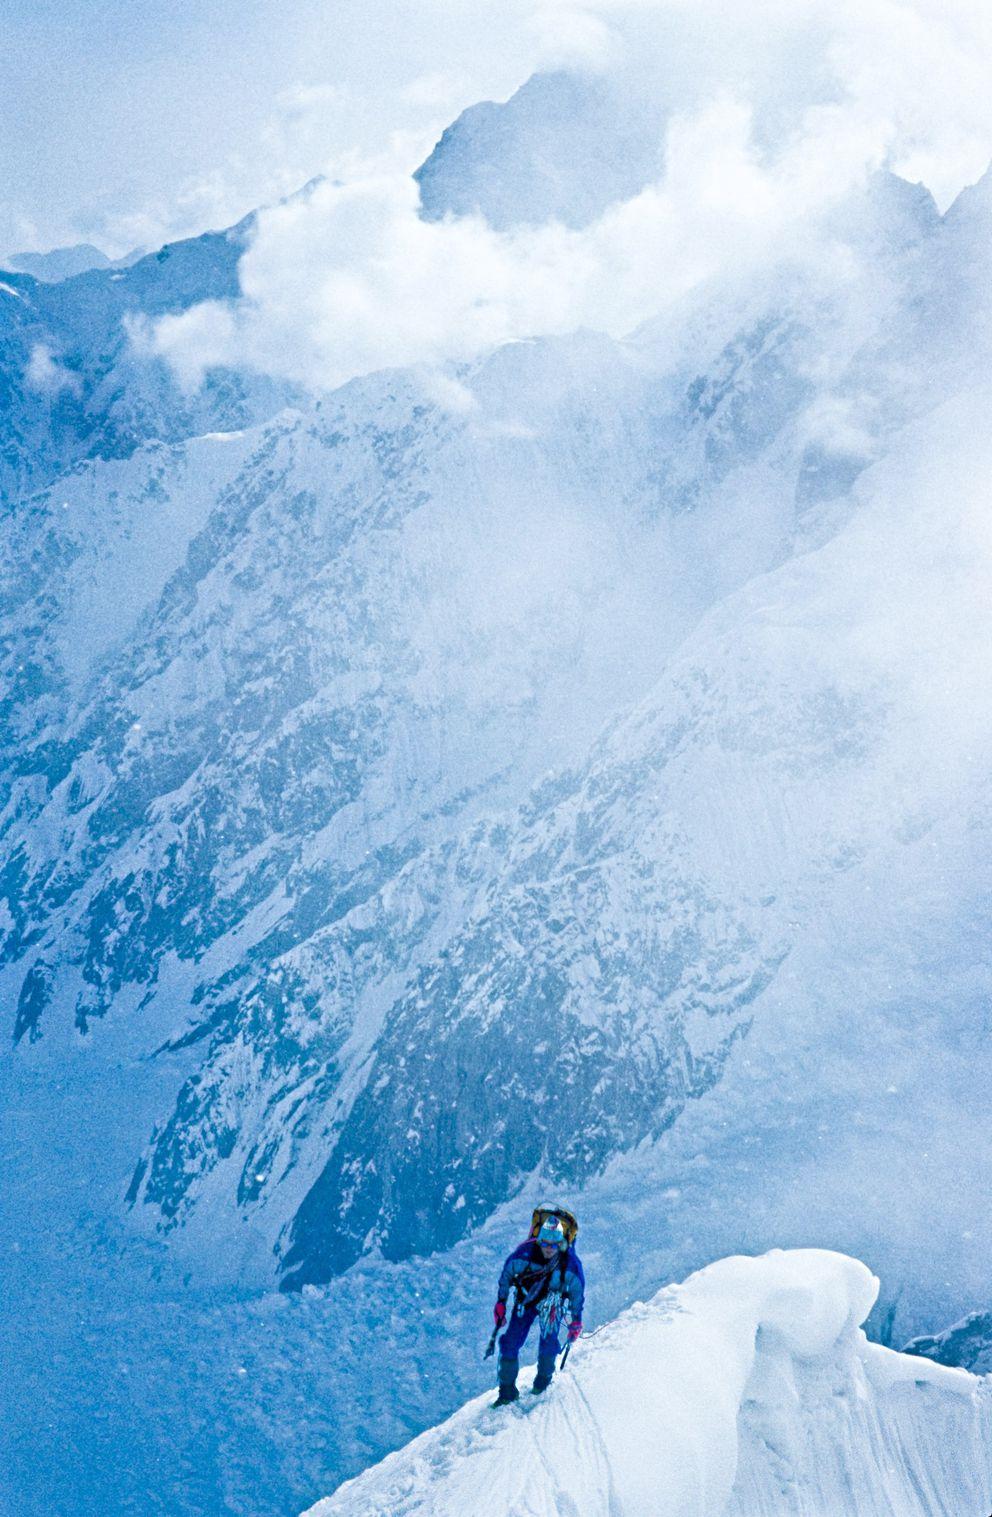 Keith Echelmeyer climbs Mount Huntington. (Photo courtesy of Susan Campbell)